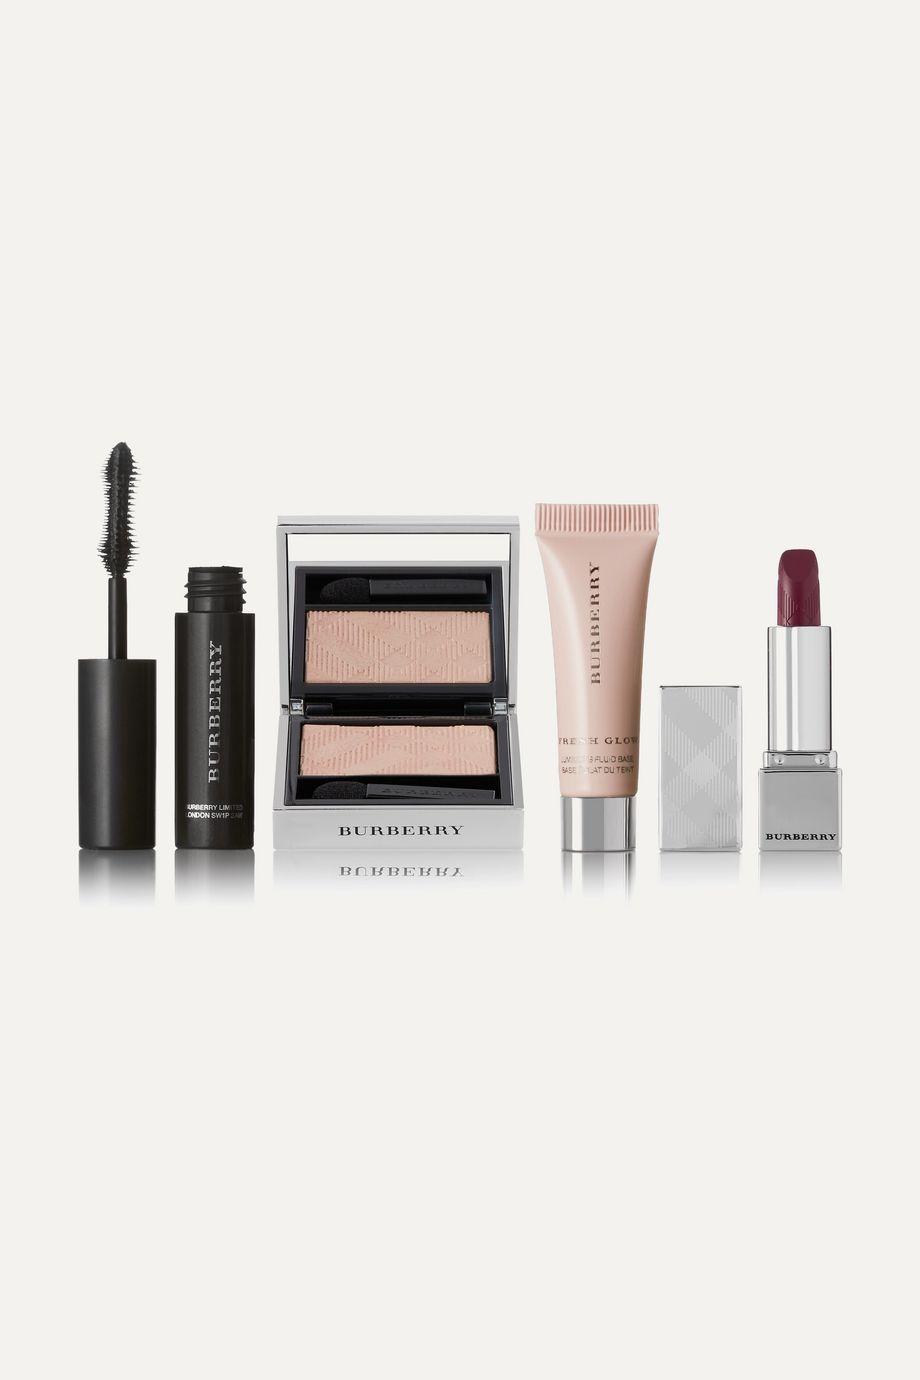 Burberry Beauty Festive Beauty Box